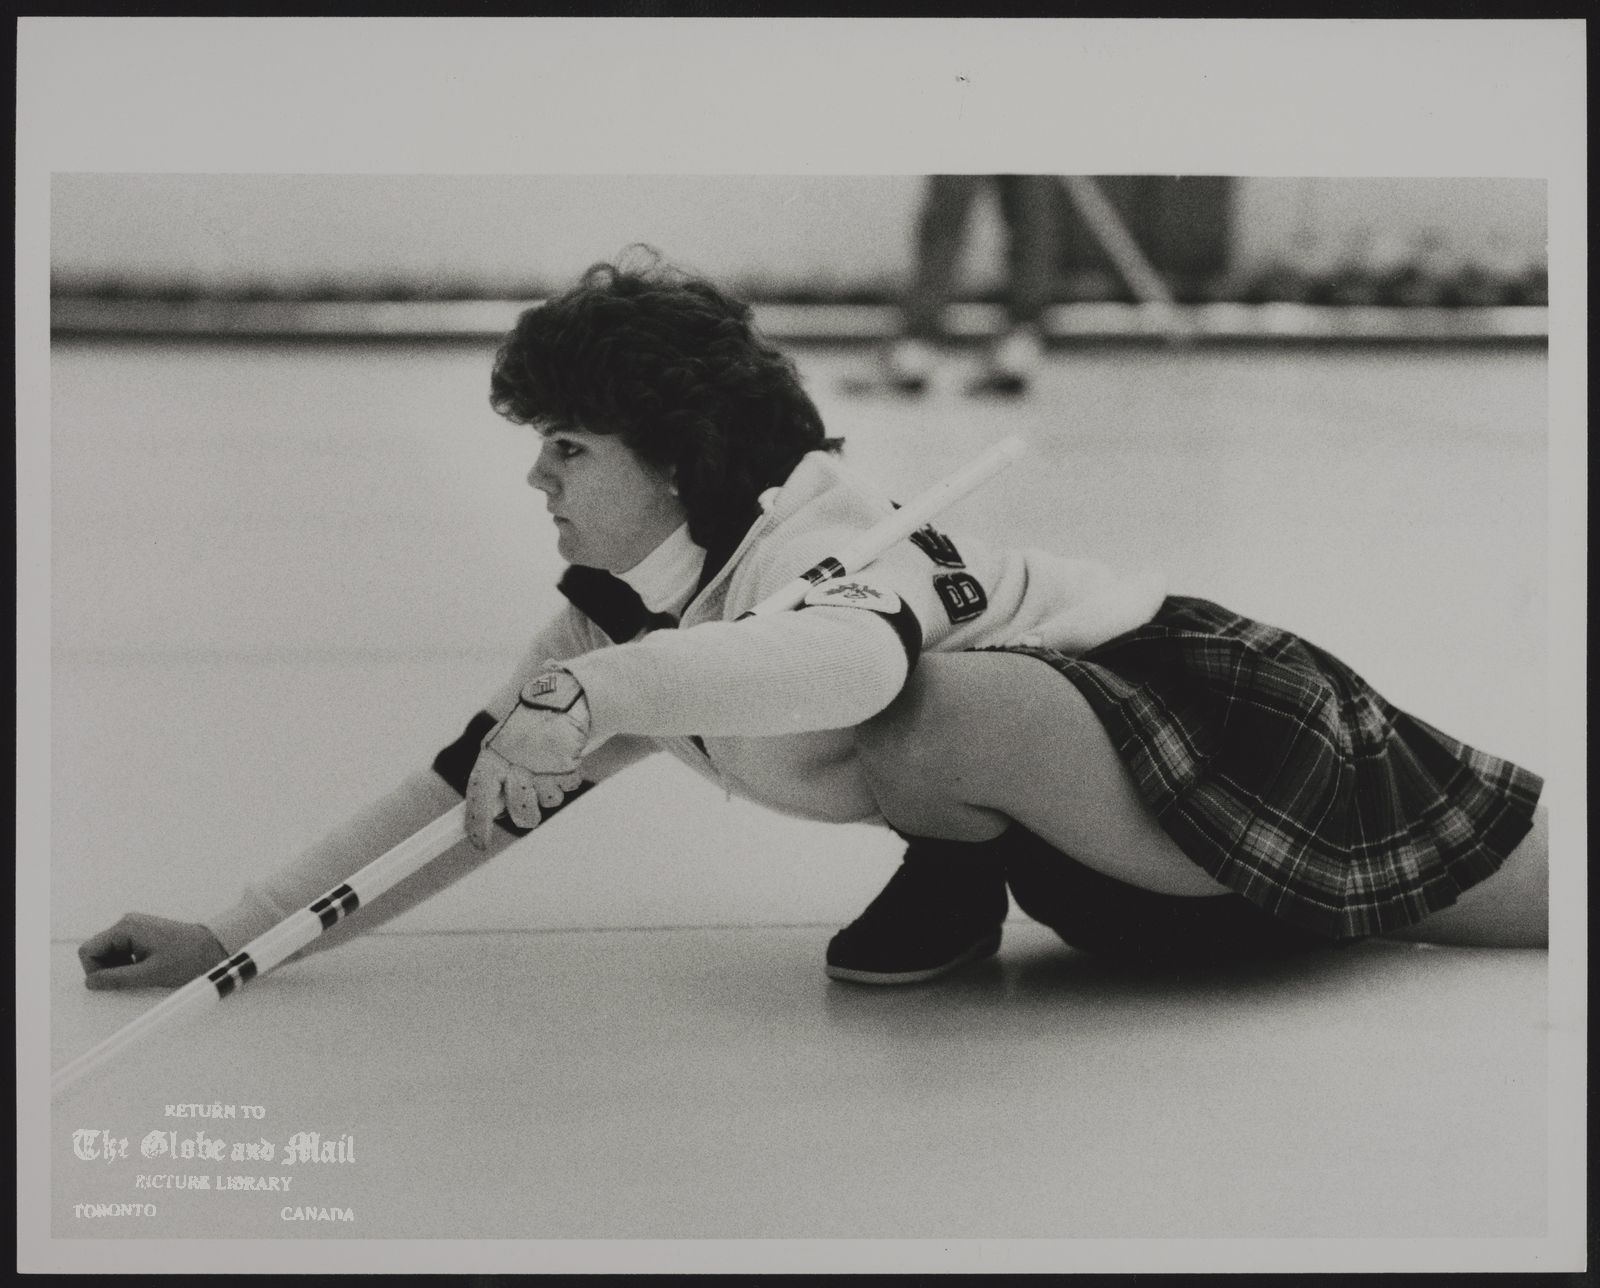 Carol Berringer